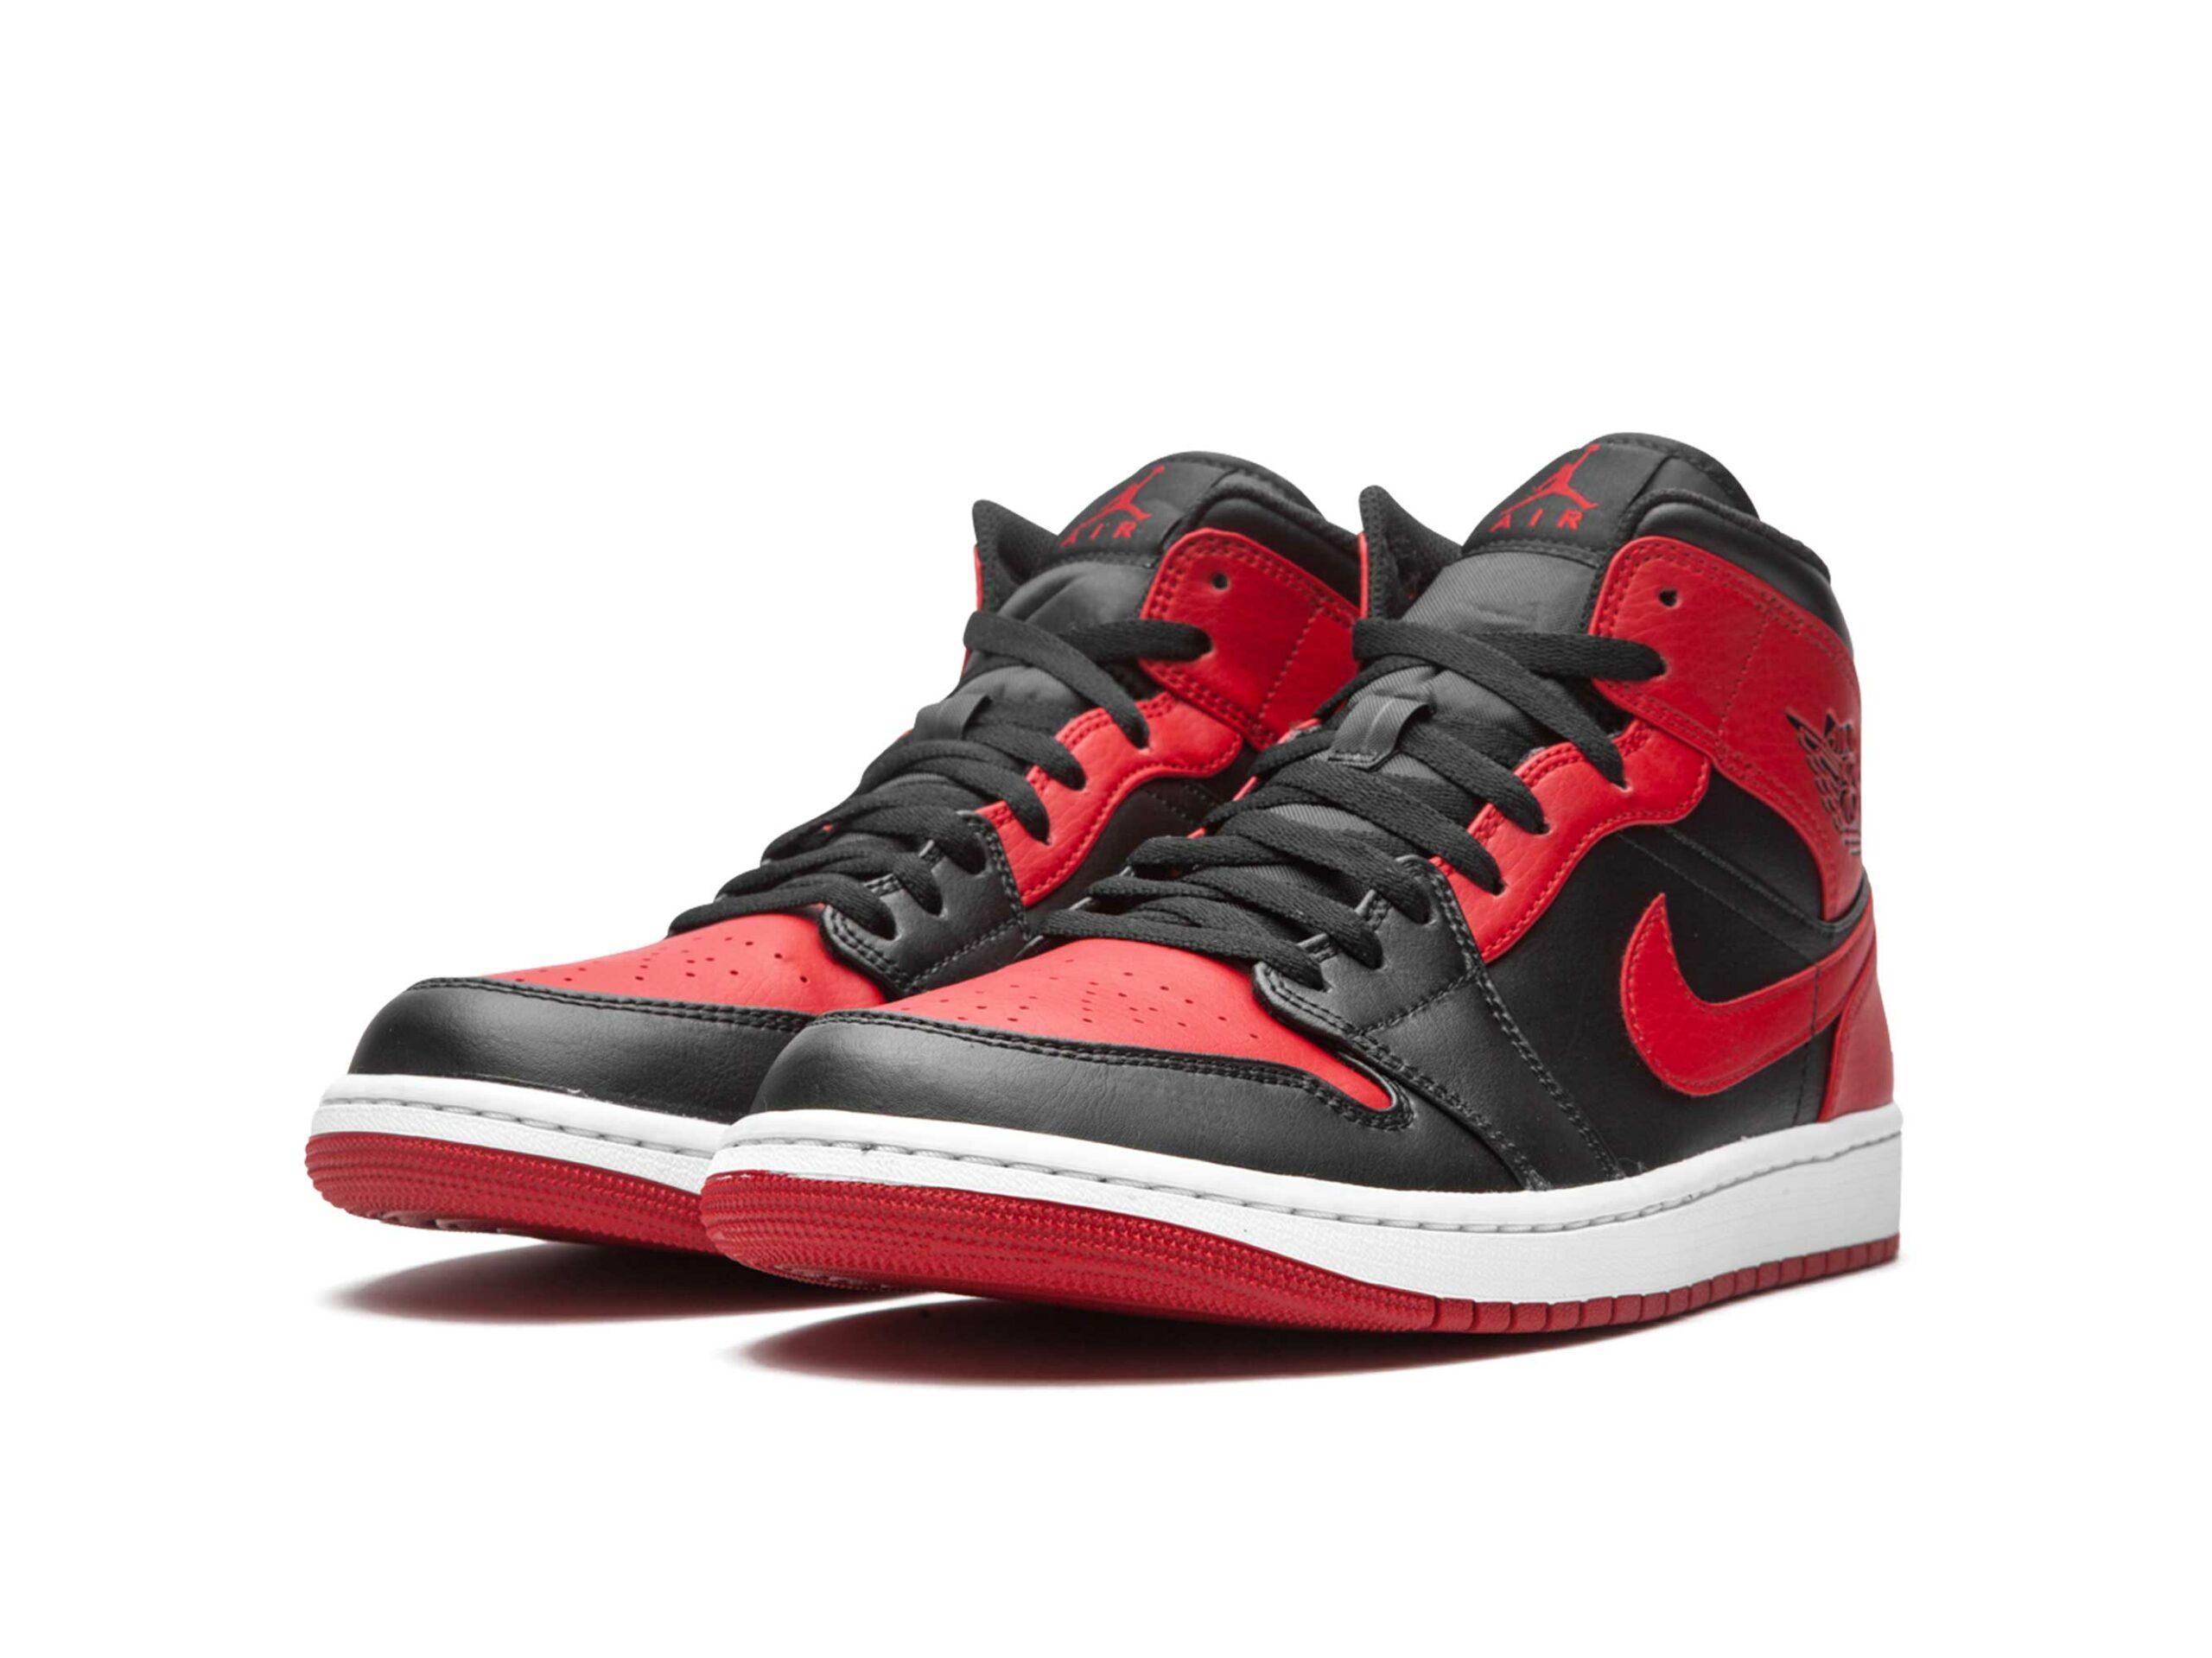 nike air Jordan 1 retro mid banned 2020 554724_074 купить